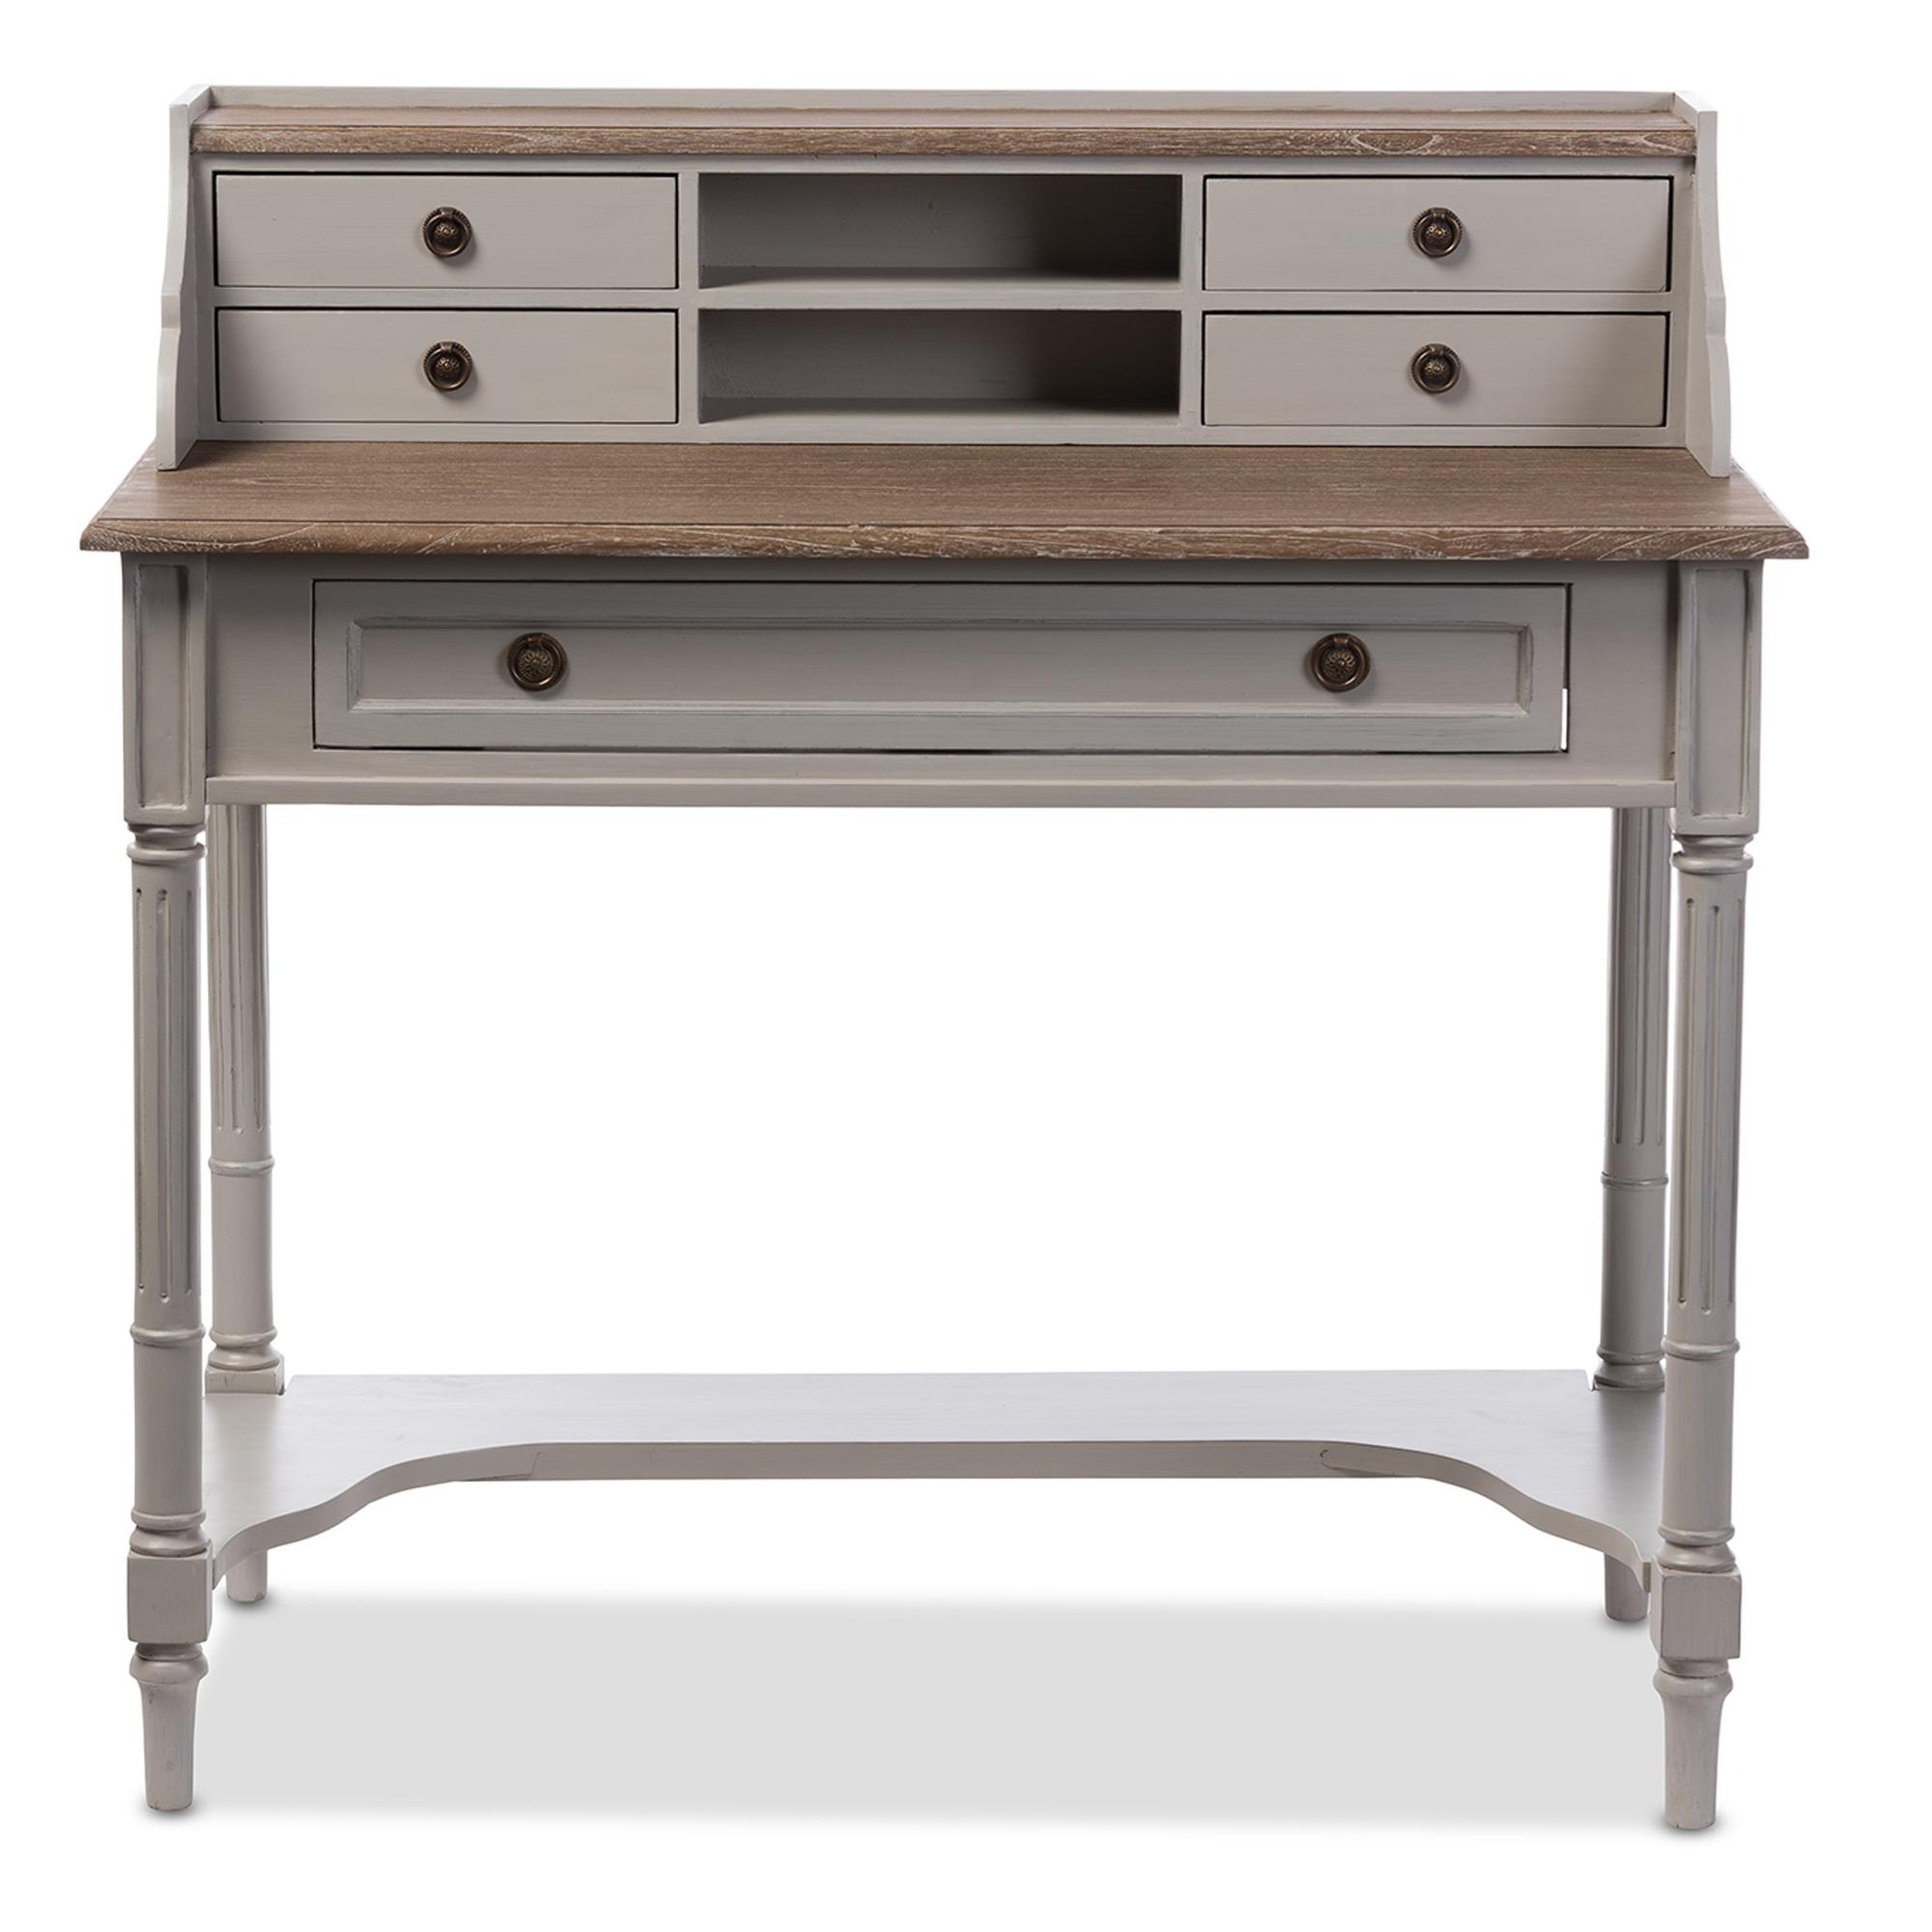 Baxton Studio | Wholesale Desks | Wholesale Home Office Furniture |  Wholesale Furniture